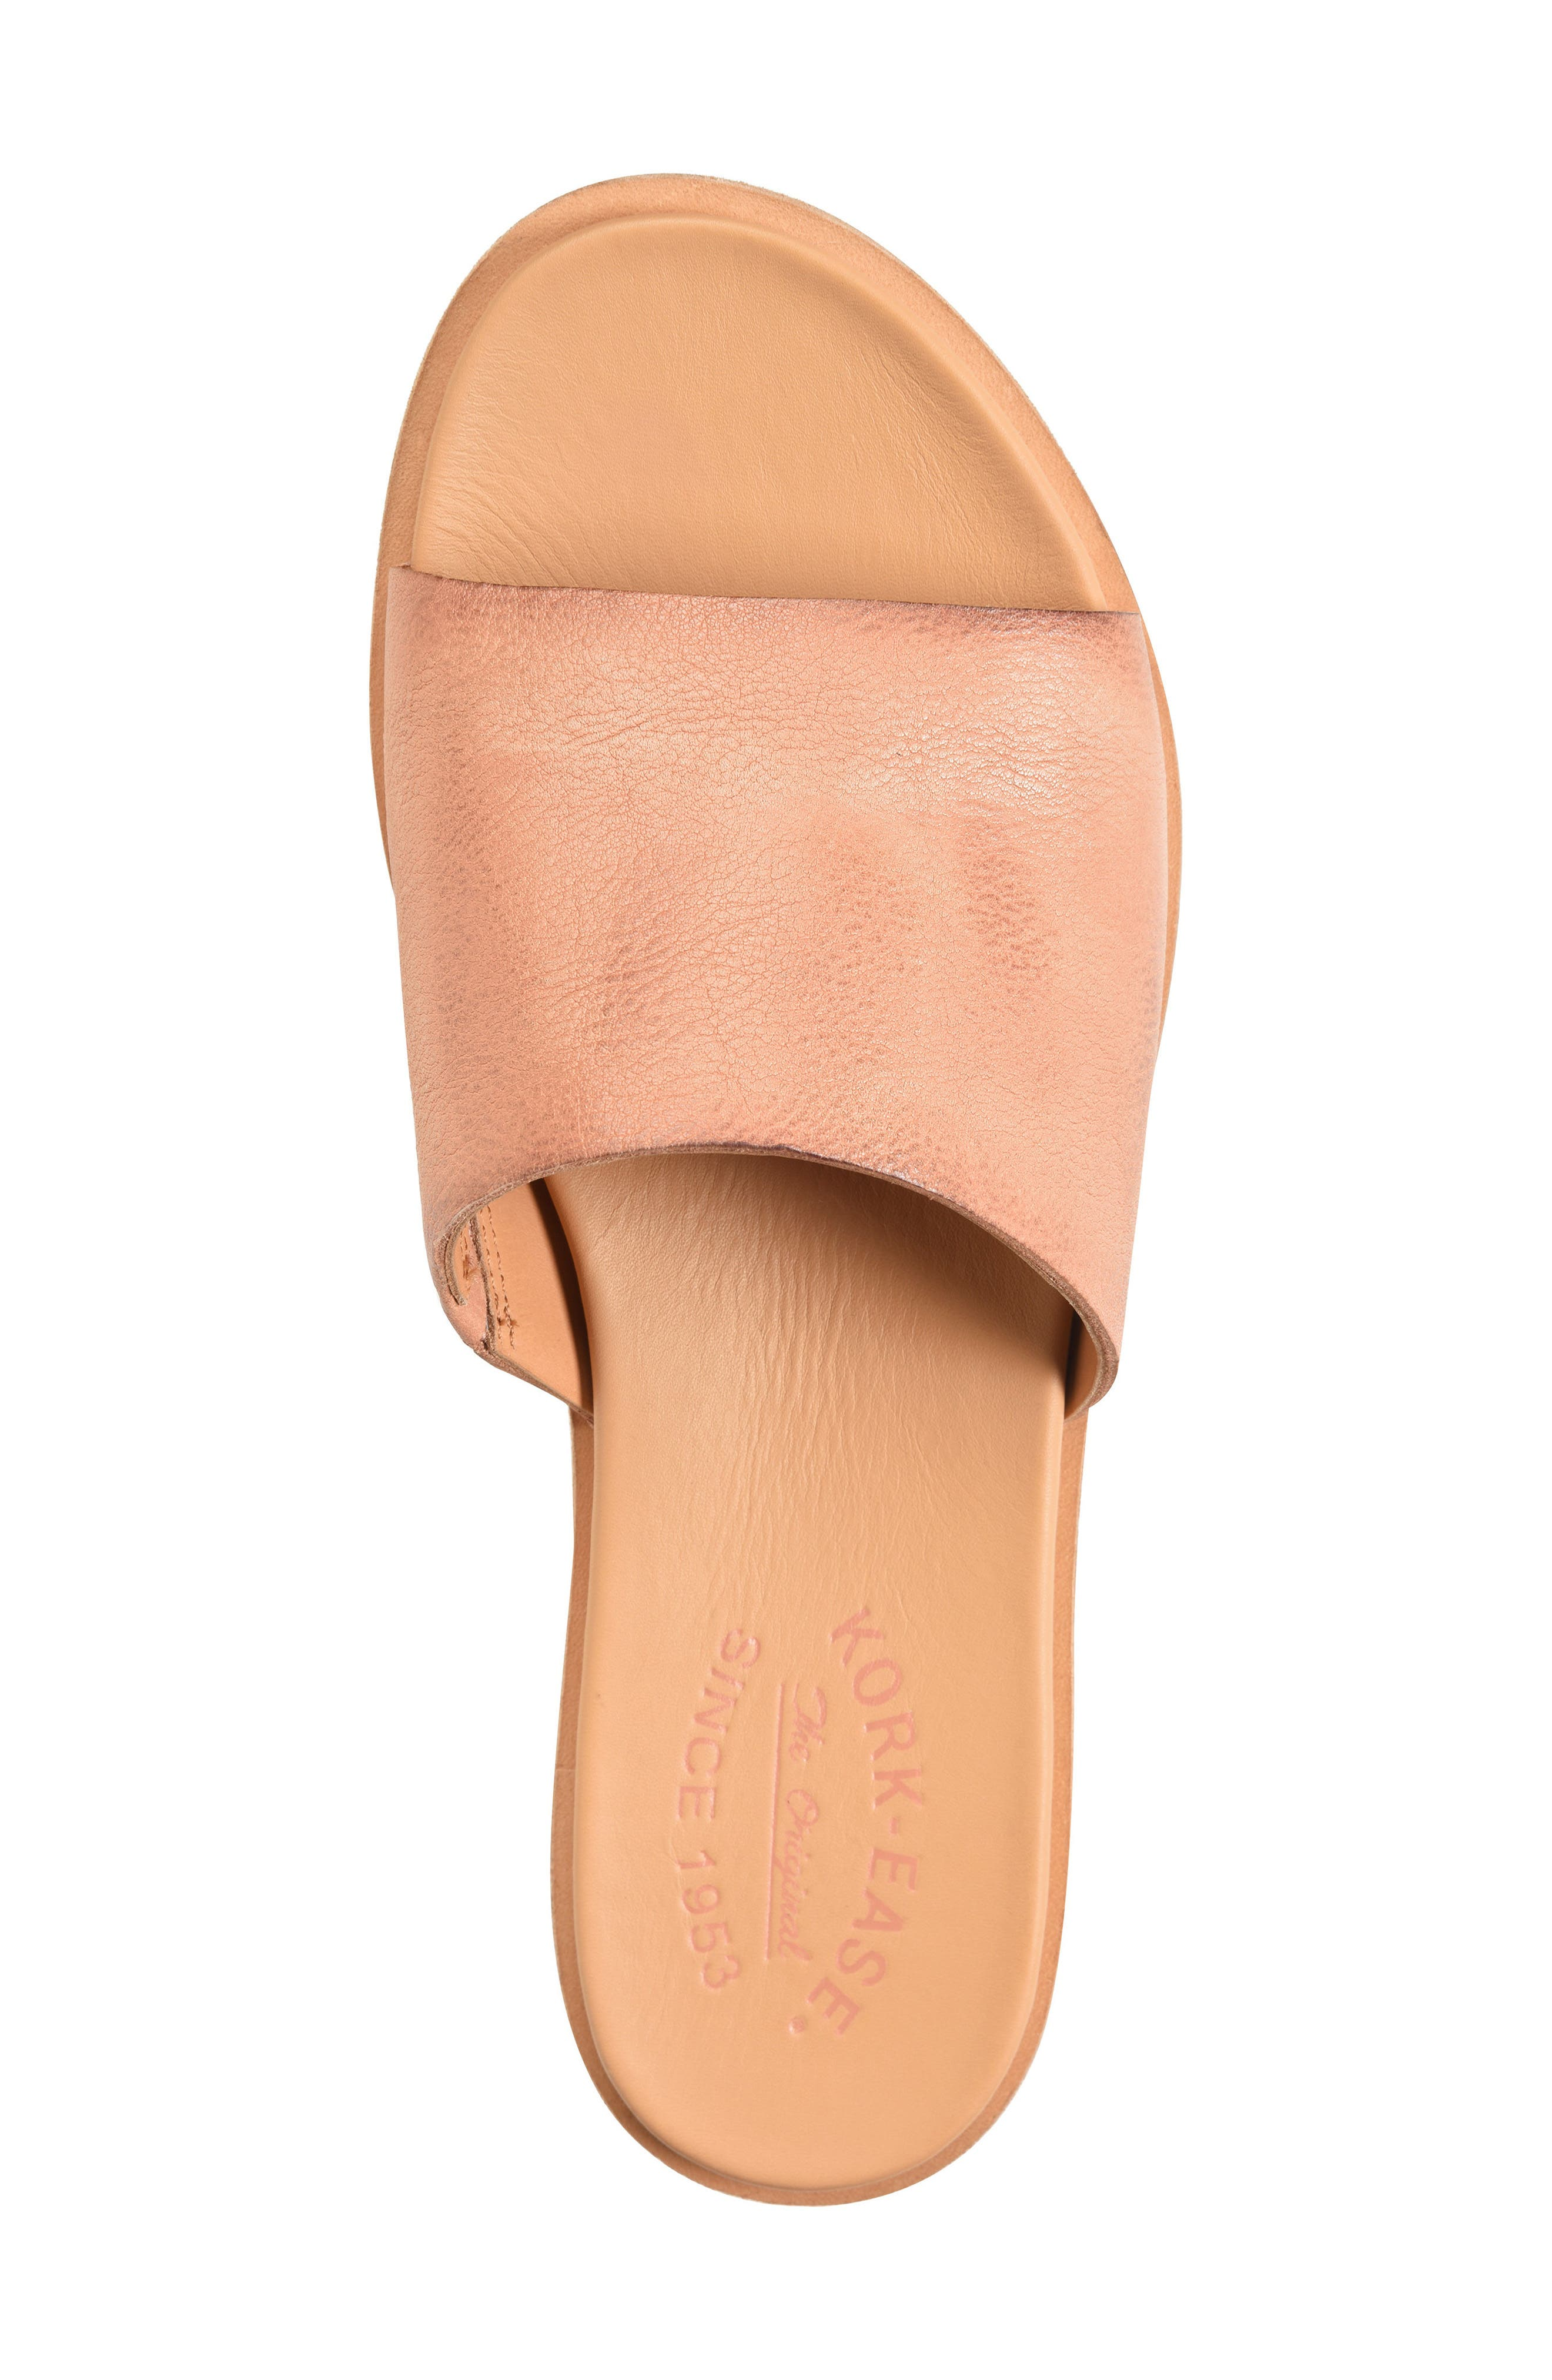 Gila Slide Sandal,                             Alternate thumbnail 5, color,                             Blush Leather